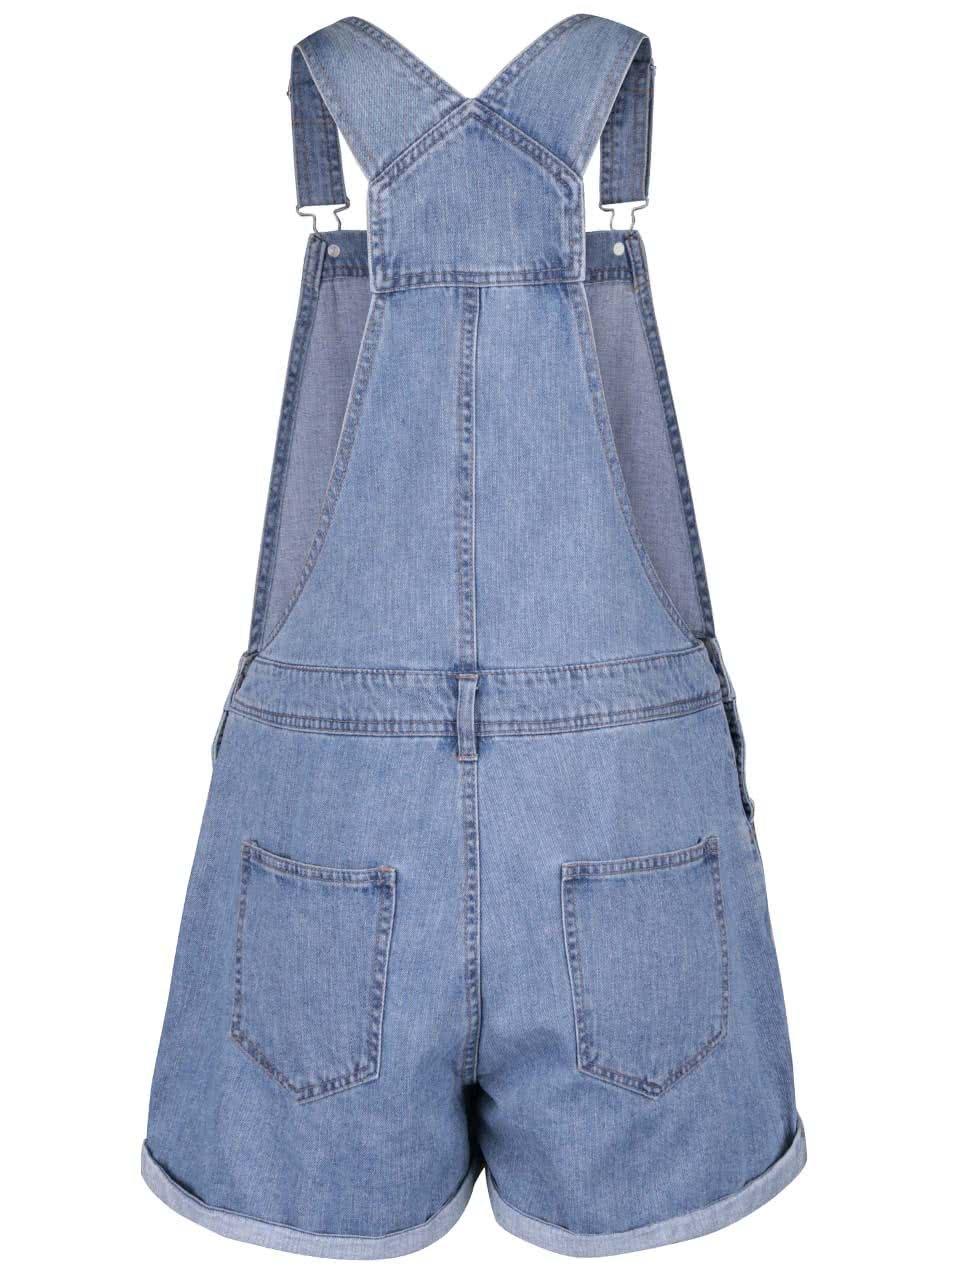 Modré džínové kraťasy s laclem Dorothy Perkins ... 80ab7218a11